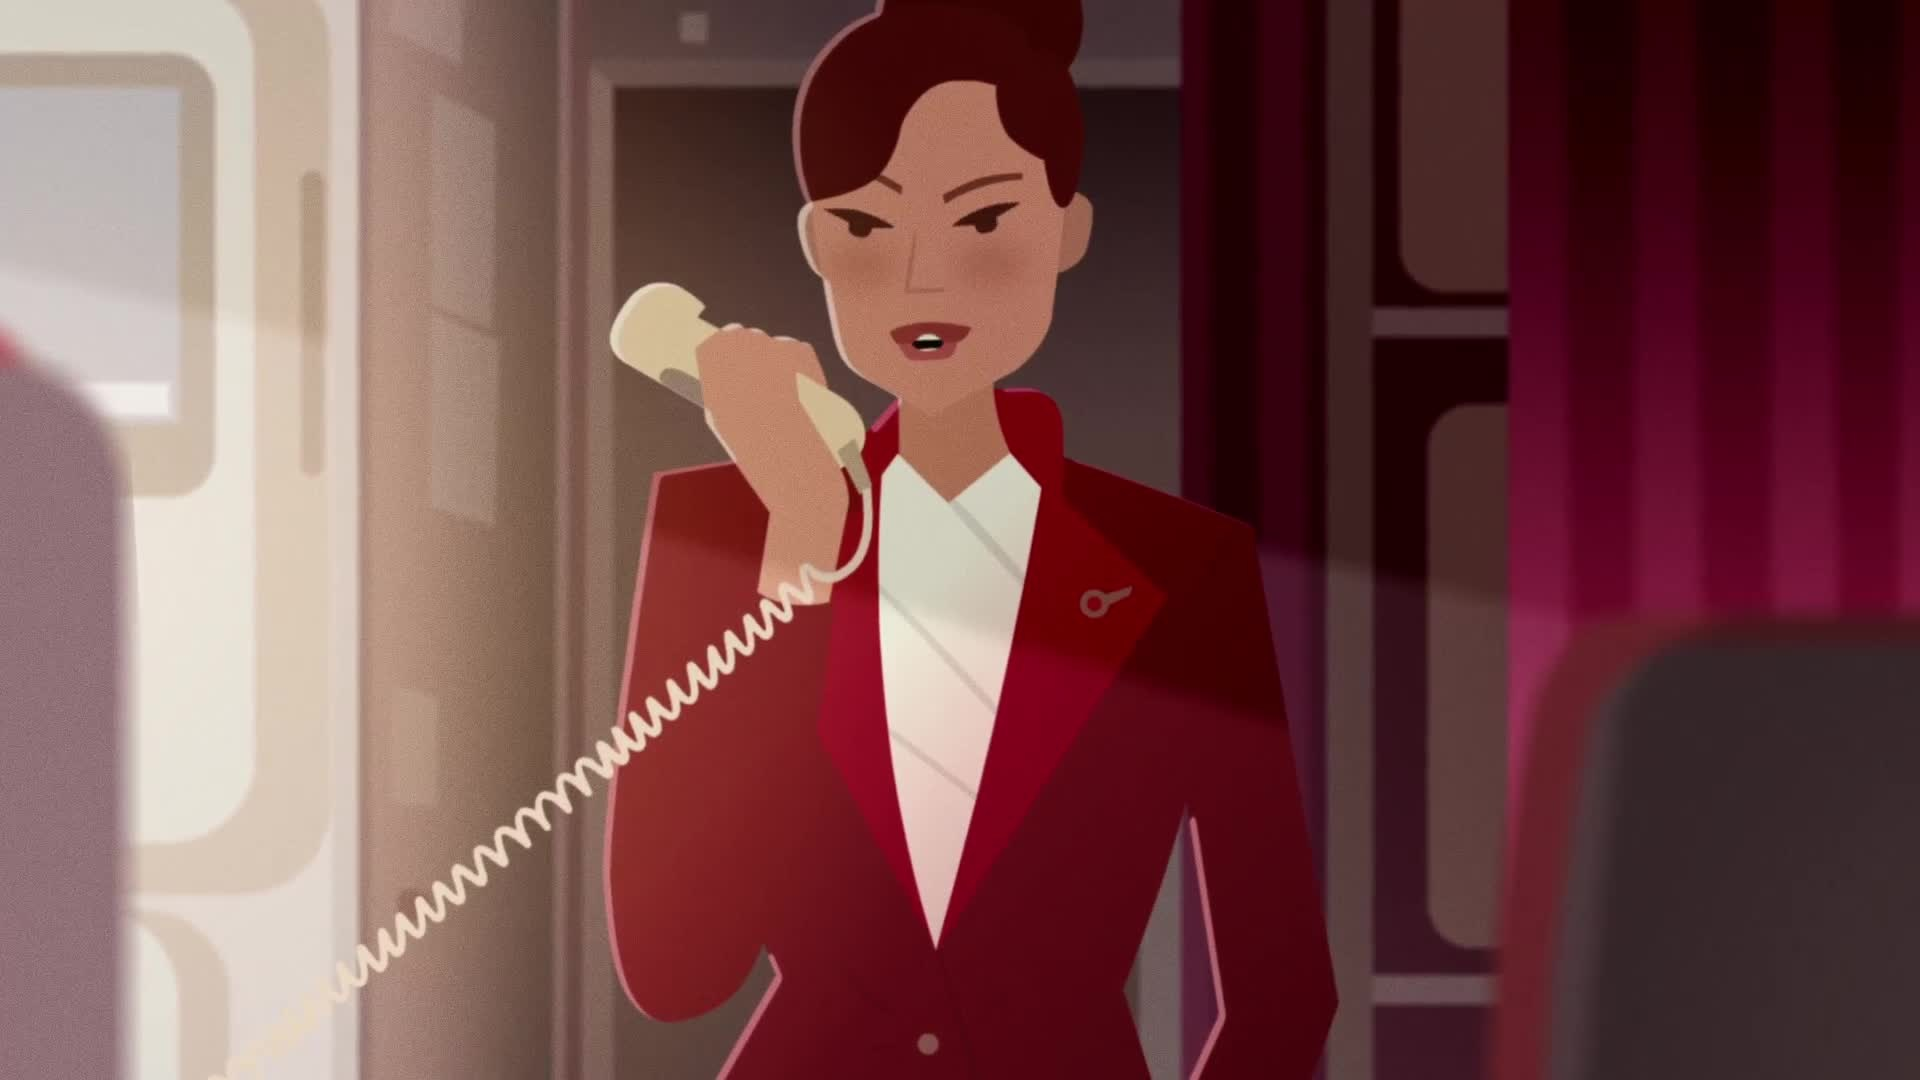 Airline | Virgin Atlantic